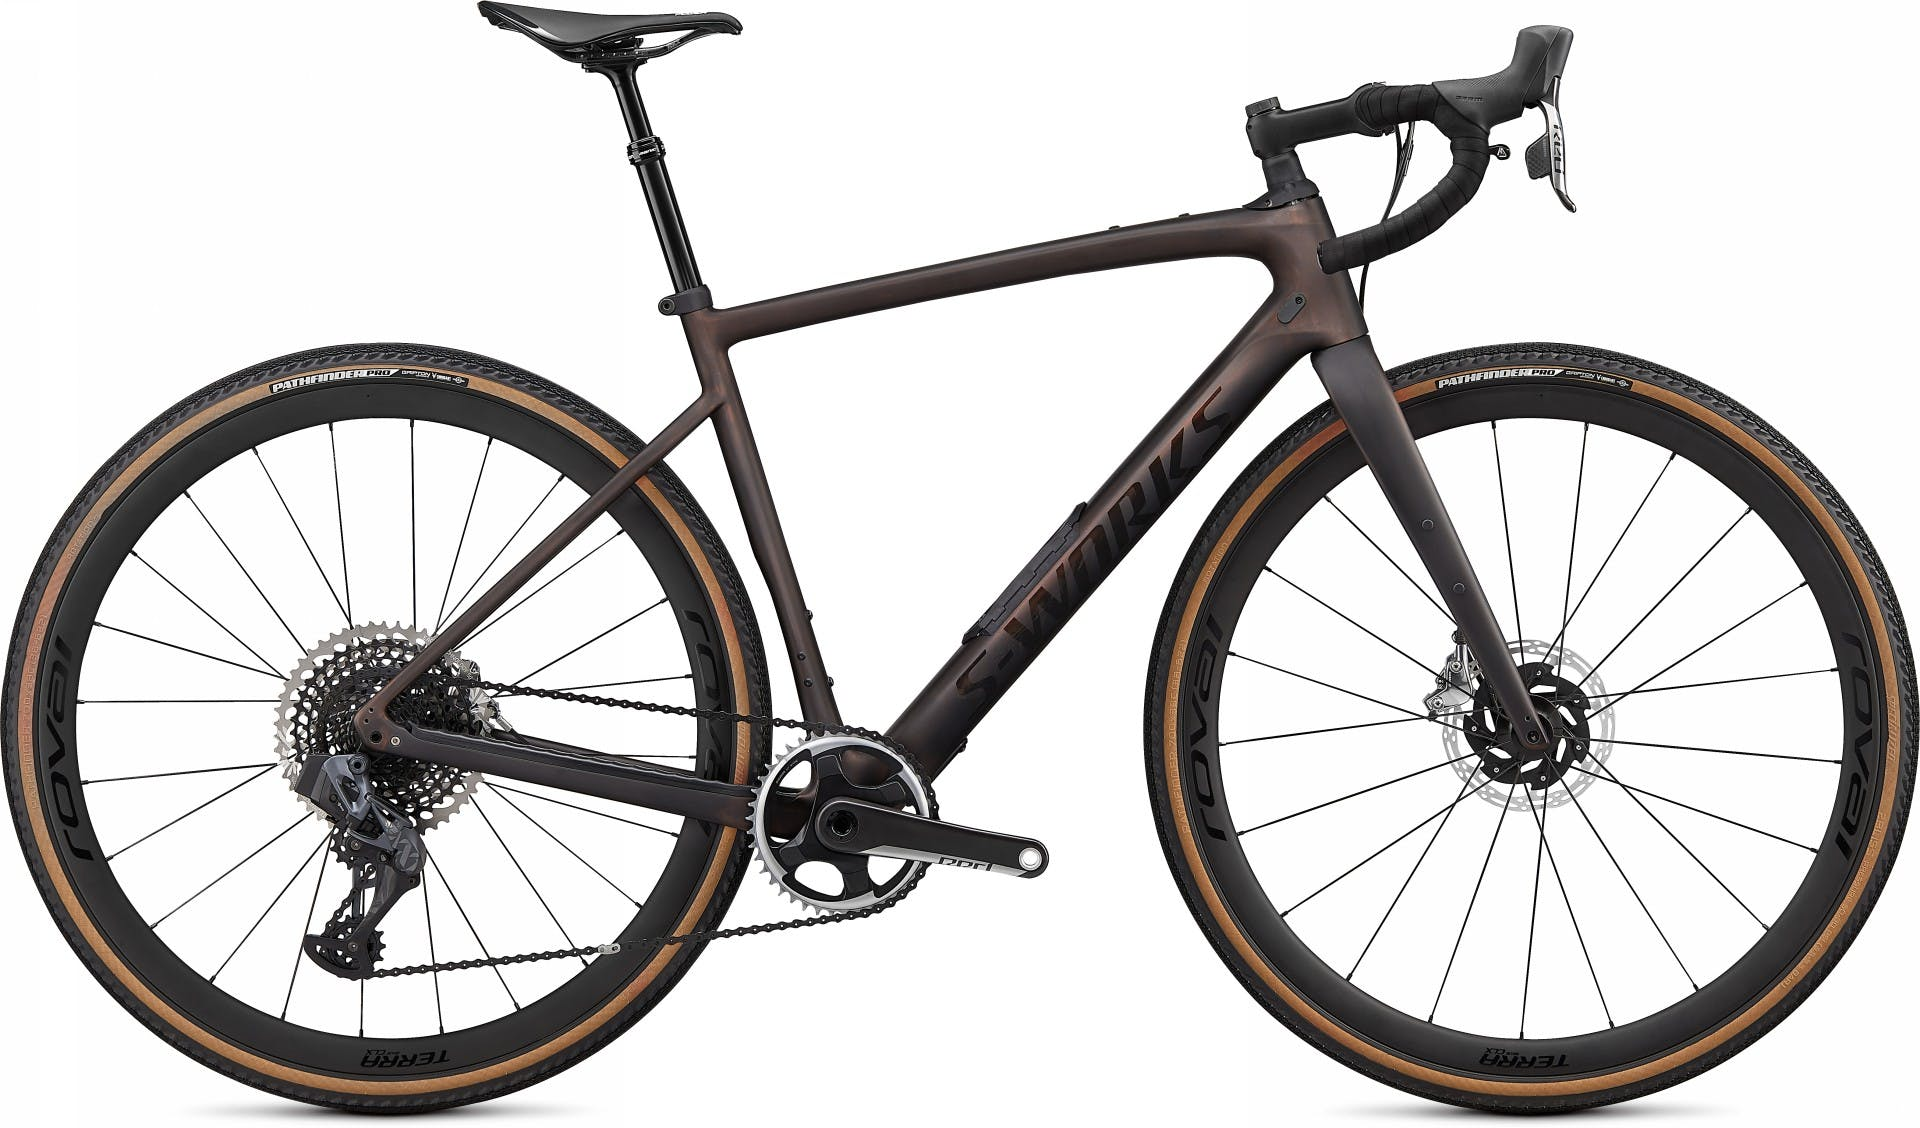 Specialized Diverge migliori bici gravel